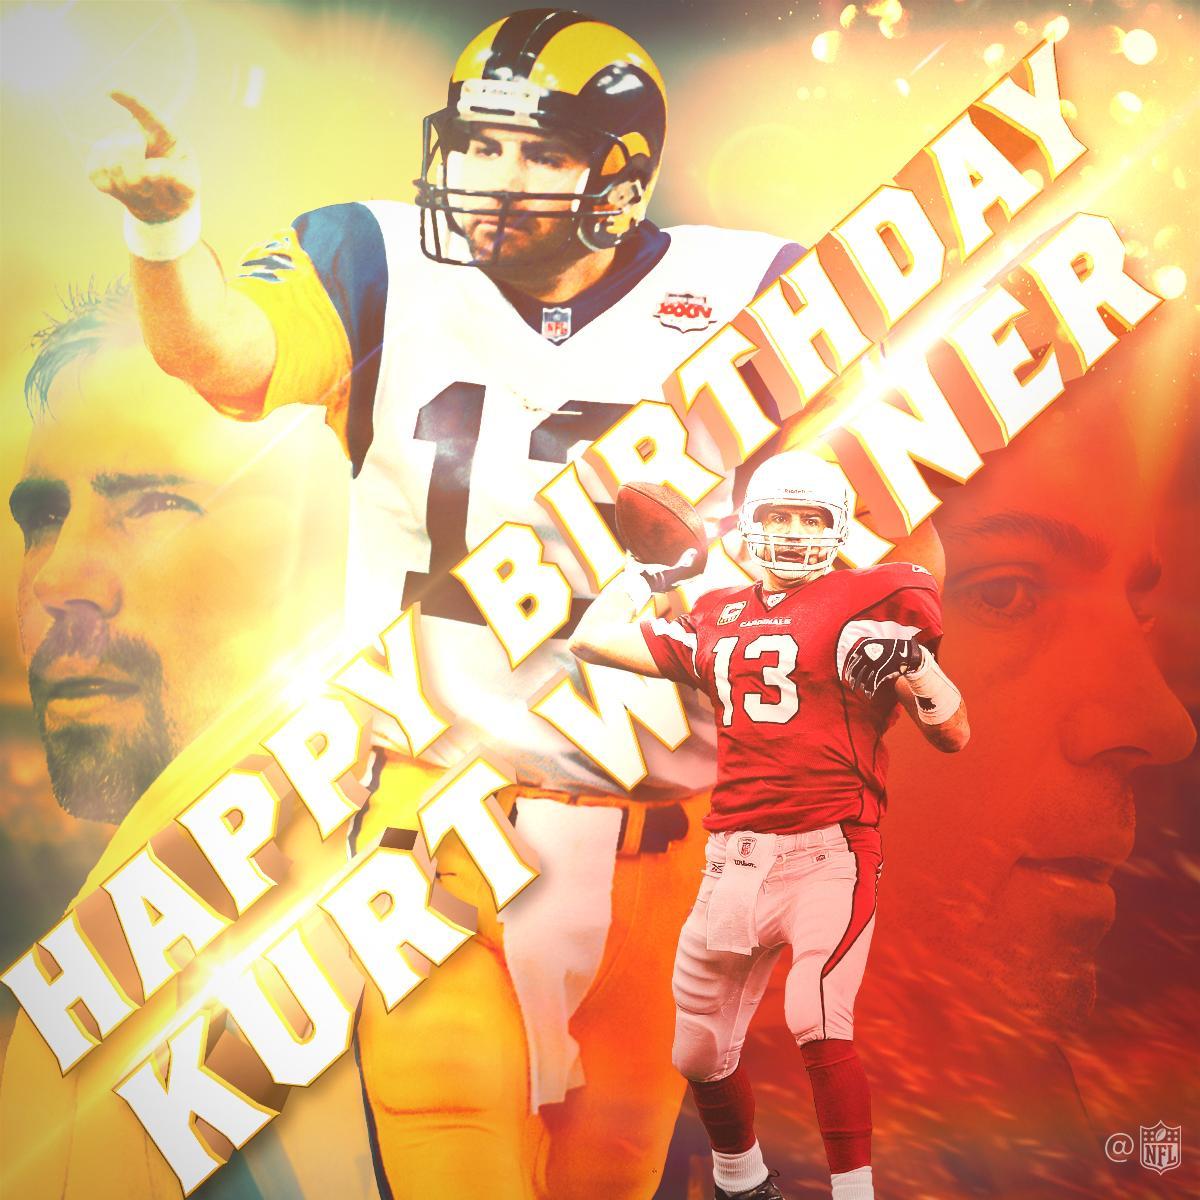 .@SuperBowl Champion. 2x MVP. @ProFootballHOF'er.  Happy Birthday to the great @kurt13warner! https://t.co/ahBTmhhTaV